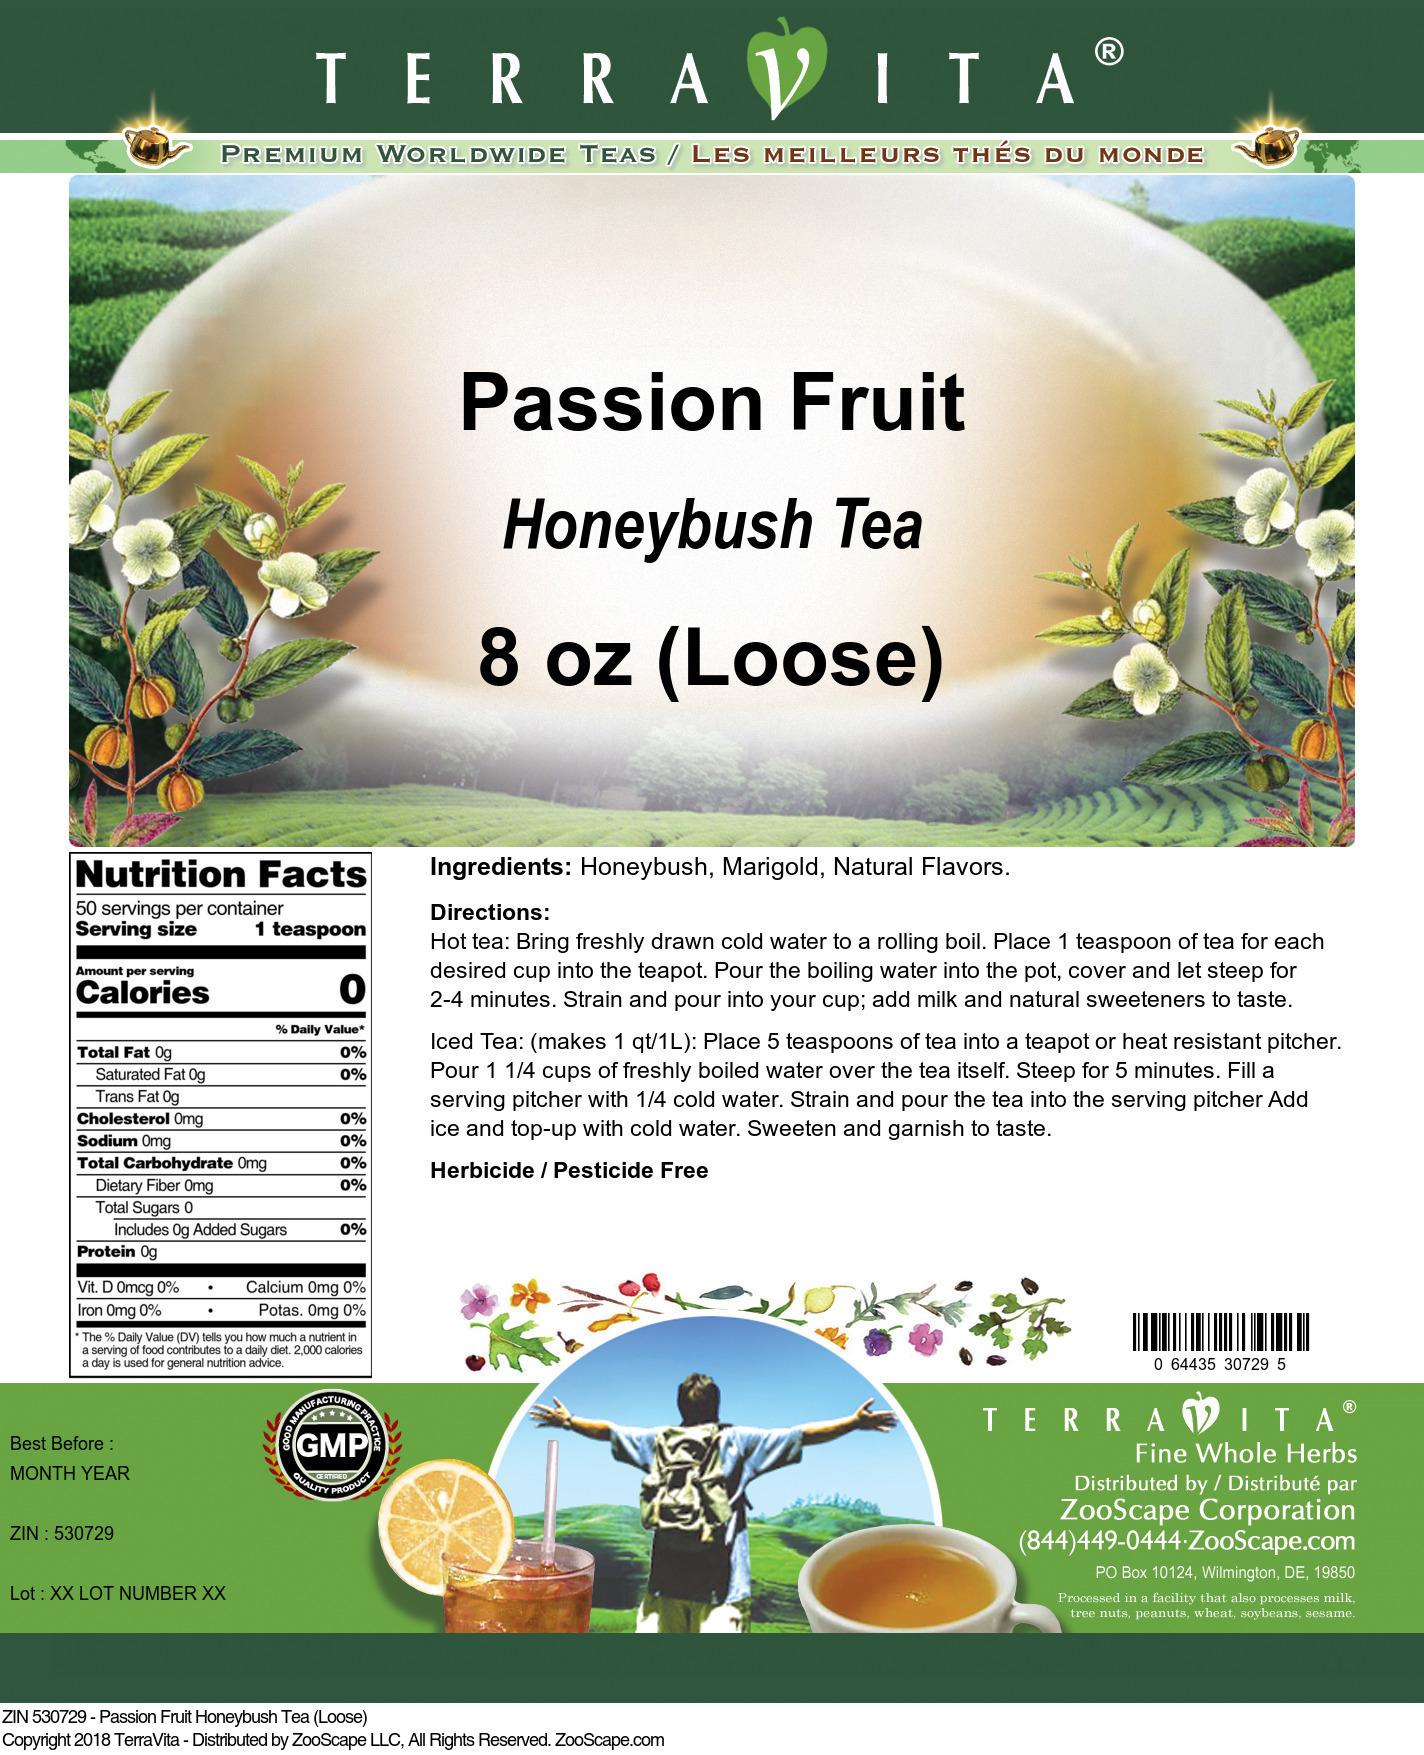 Passion Fruit Honeybush Tea (Loose)